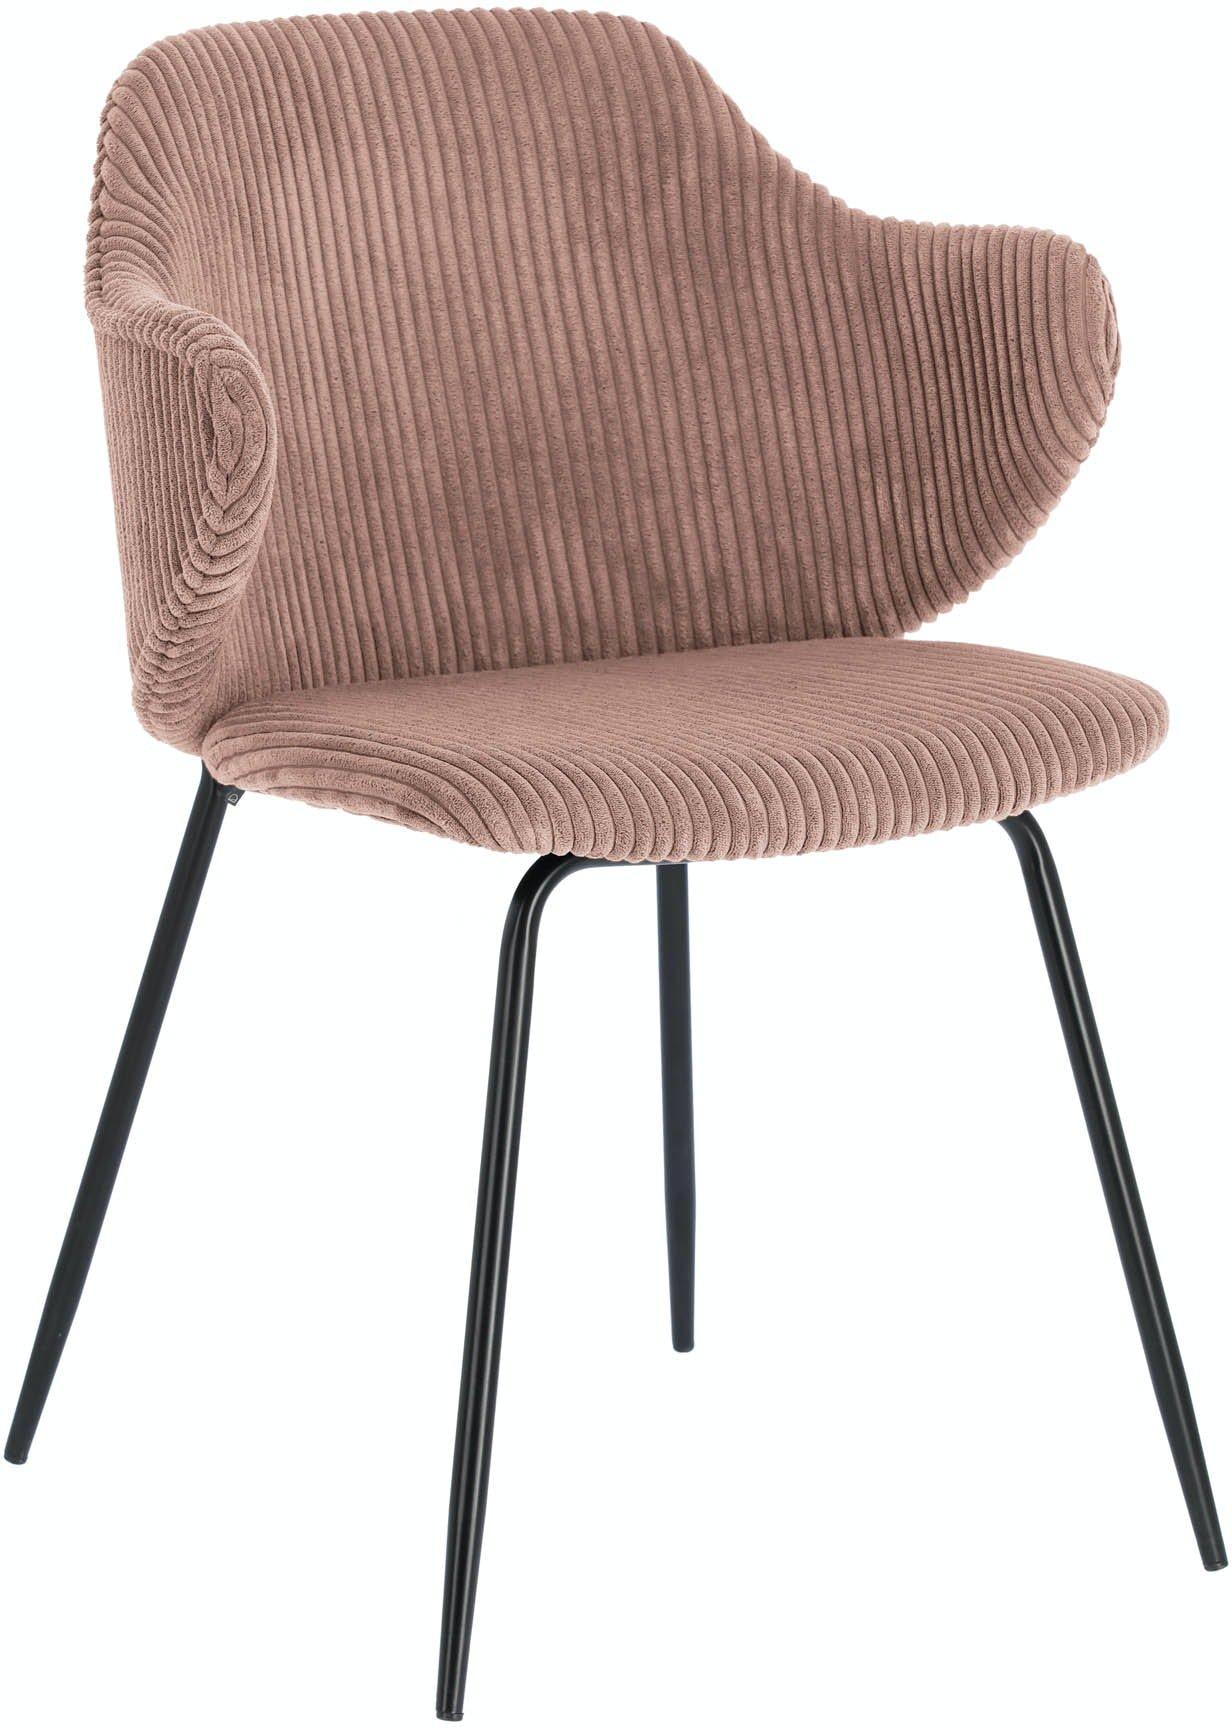 Suanne, Spisebordsstol m. armlæn, Fløjl by LaForma (H: 79 cm. B: 54 cm. L: 55 cm., Lyserød)